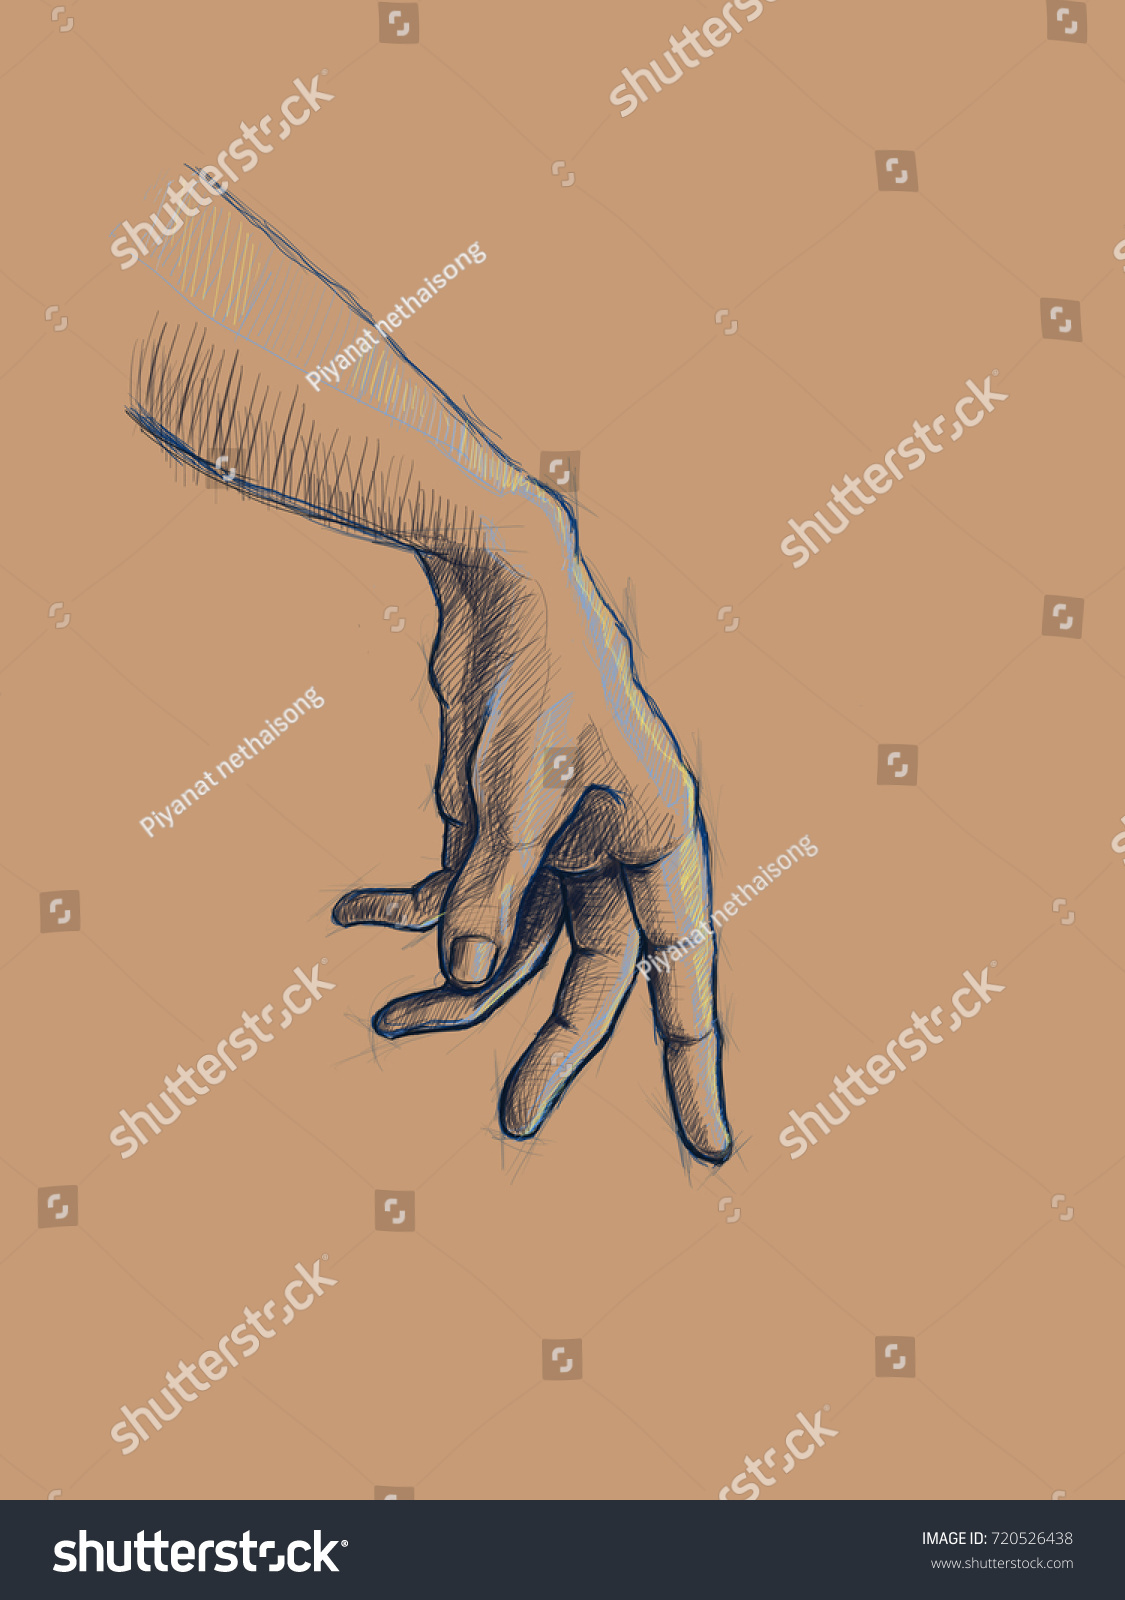 Hand Sketch Hand Drawing Digital Painting Stock Illustration ...